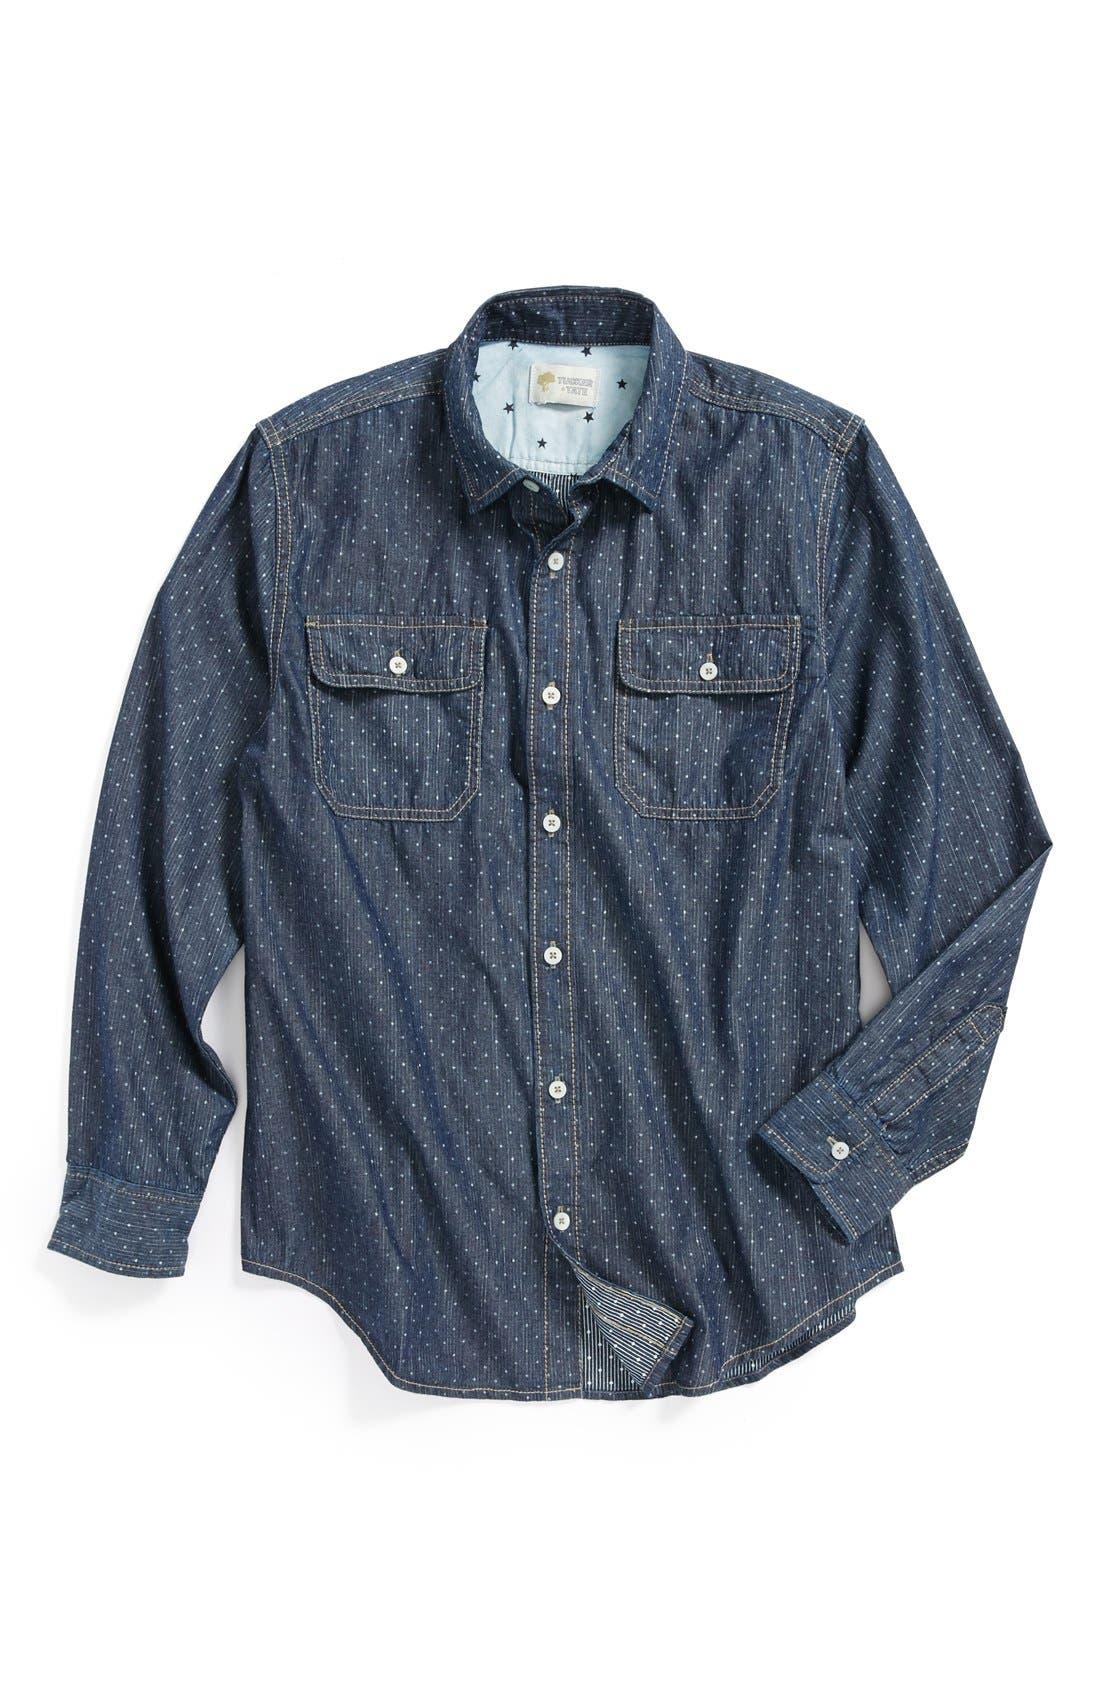 Alternate Image 1 Selected - Tucker + Tate 'Anker' Chambray Sport Shirt (Big Boys)